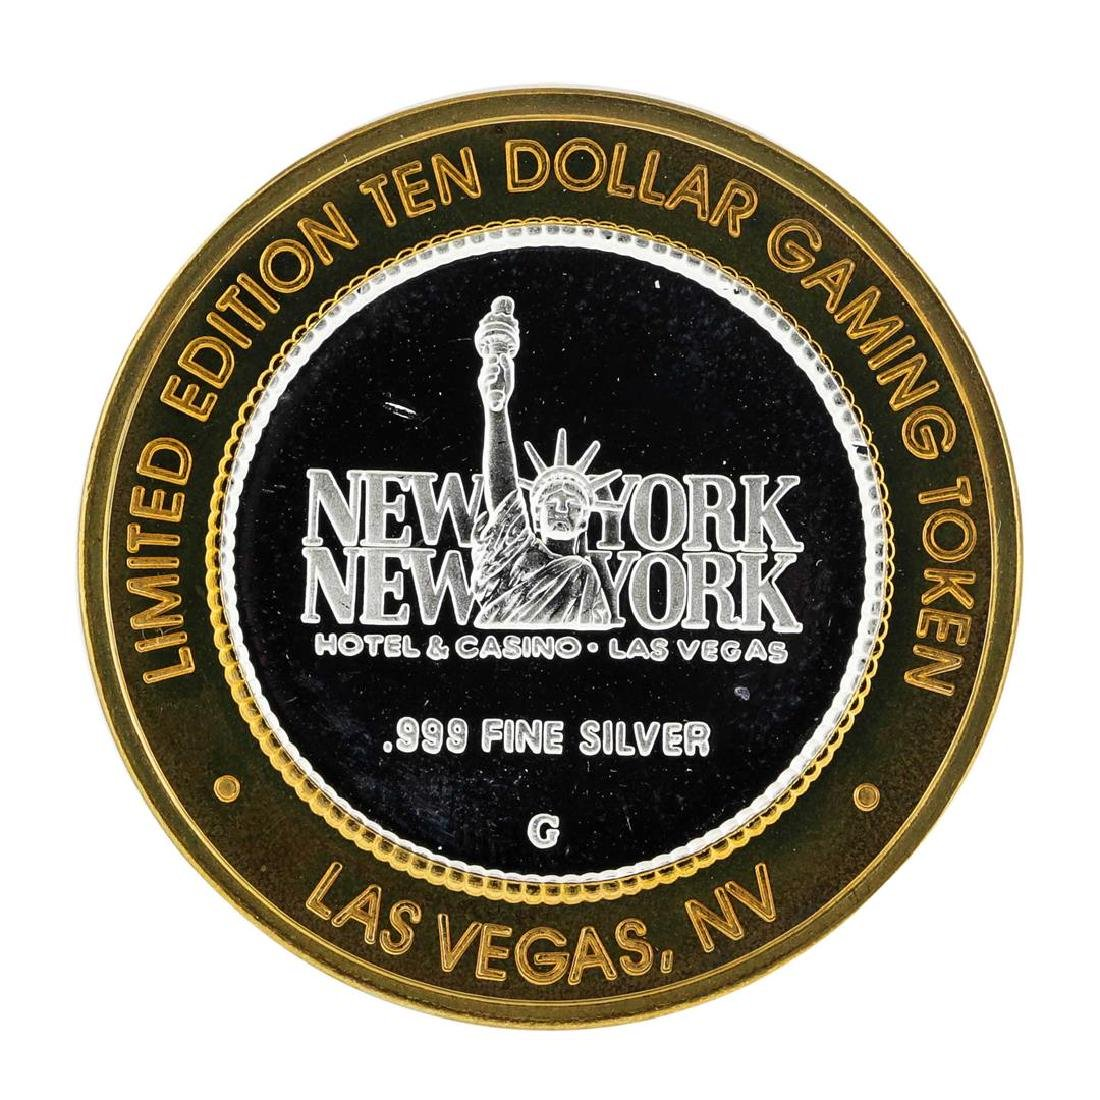 .999 Silver New York New York Hotel & Casino $10 Casino - 2